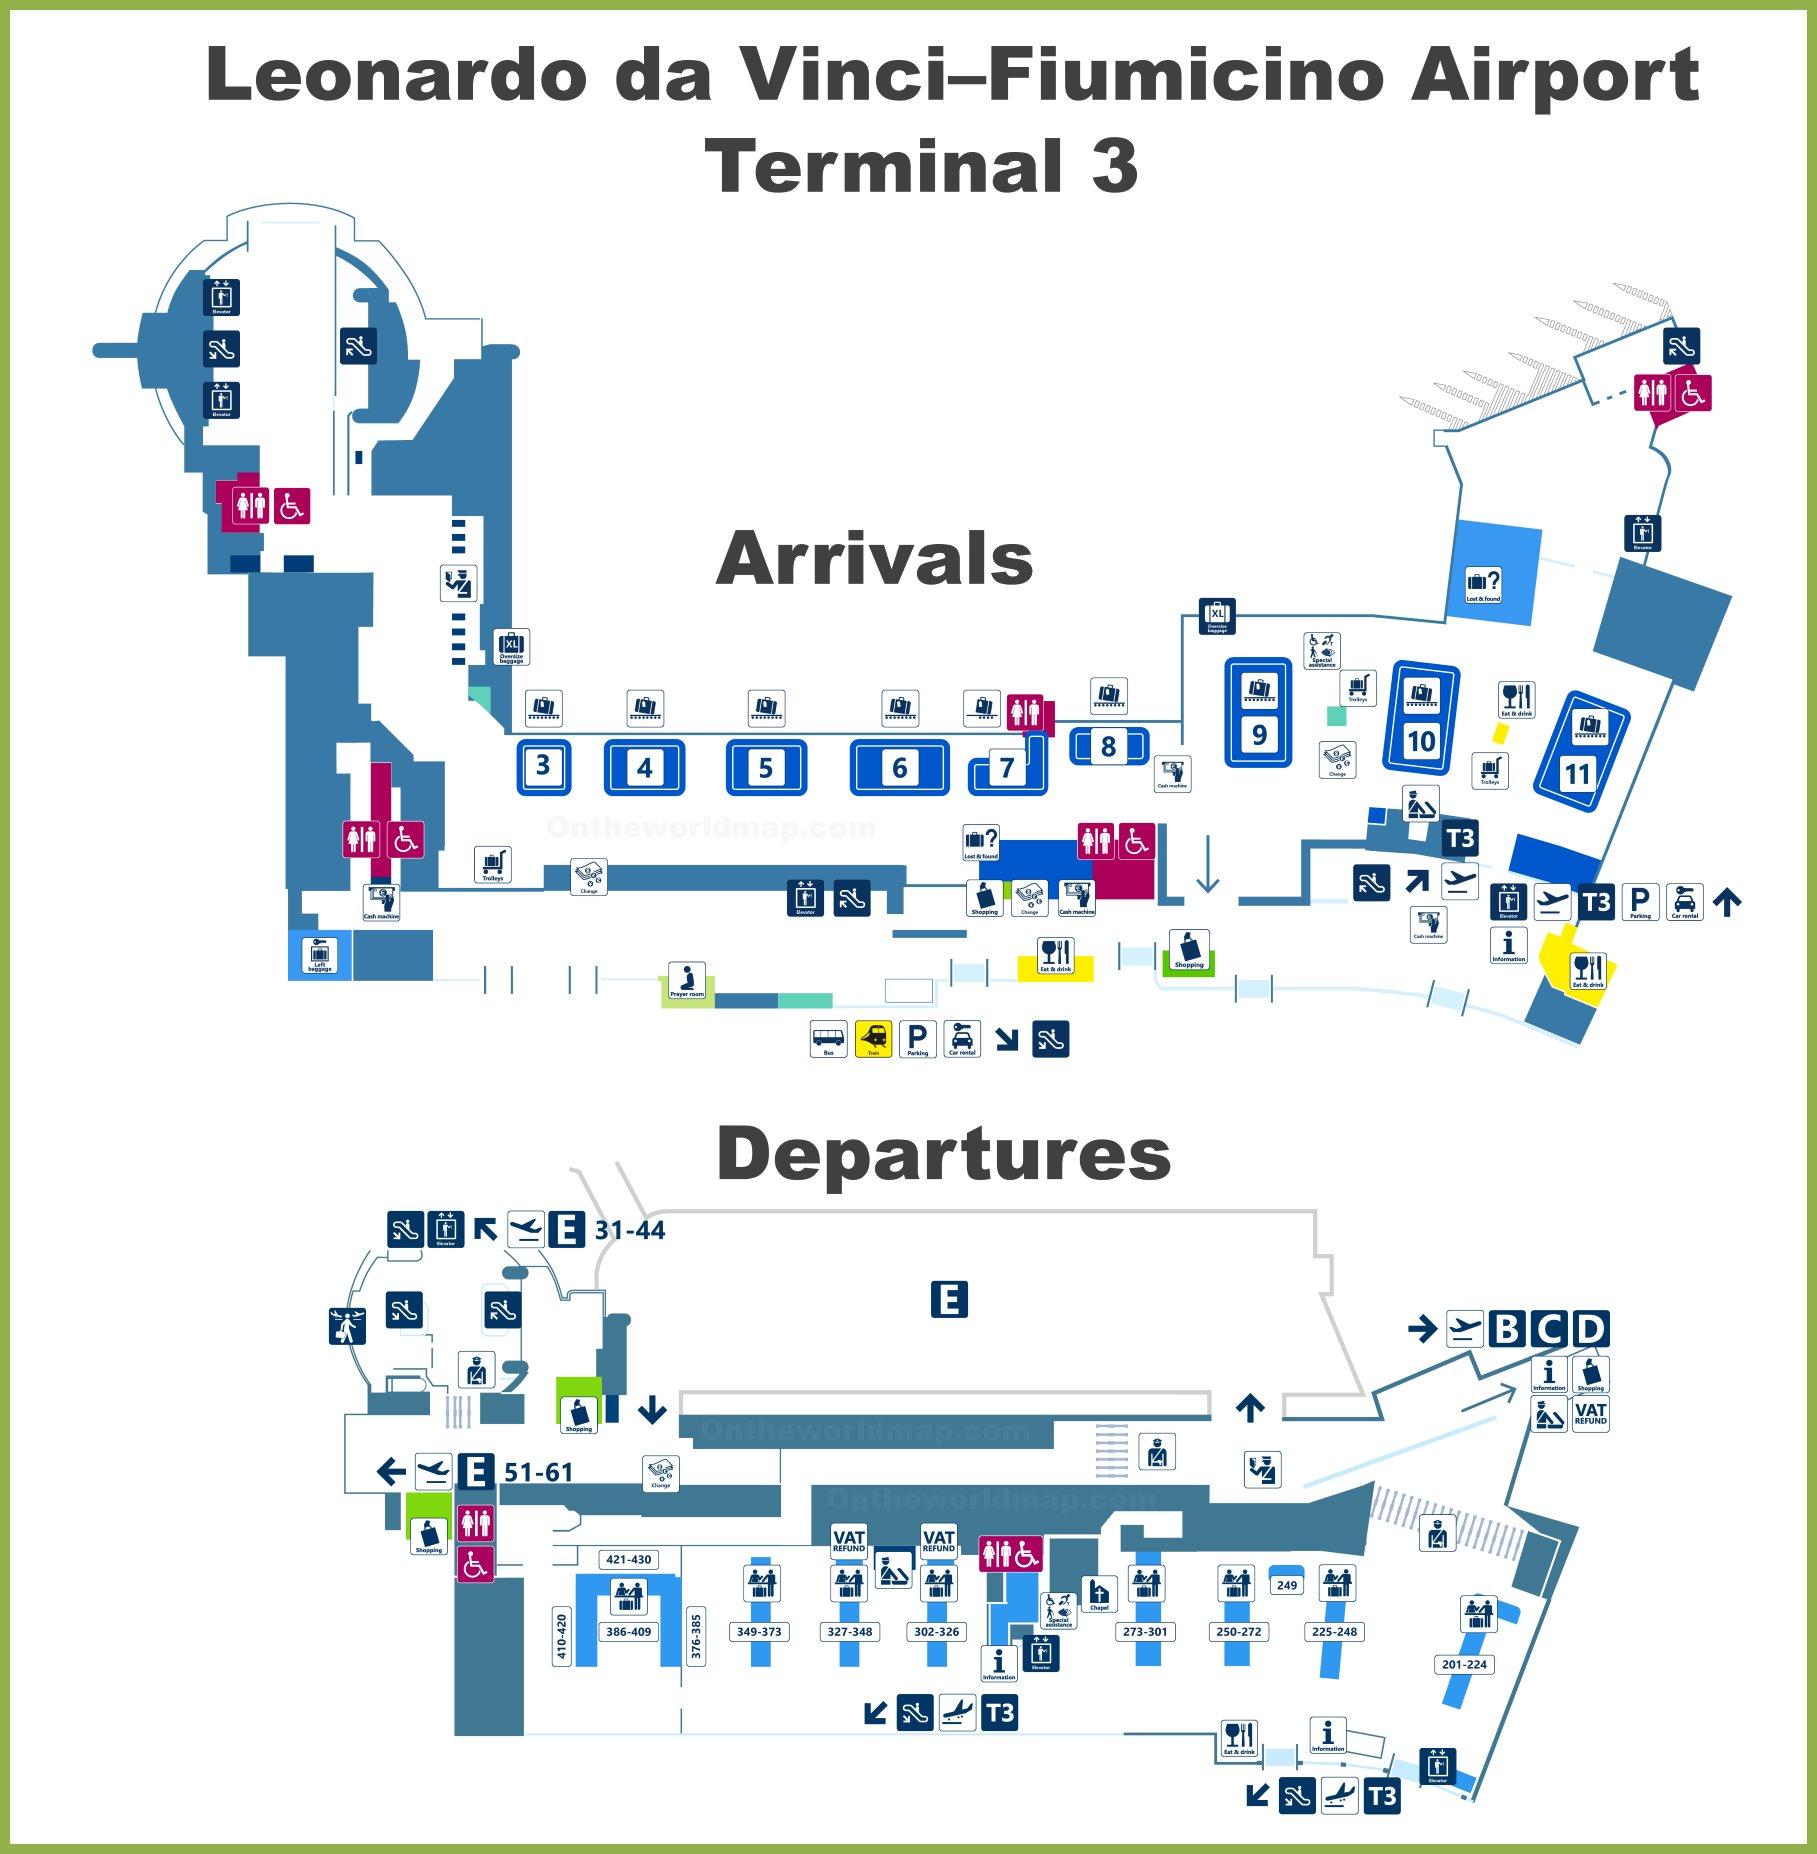 las vegas terminal 3 map Fiumicino Airport Terminal 3 Map las vegas terminal 3 map